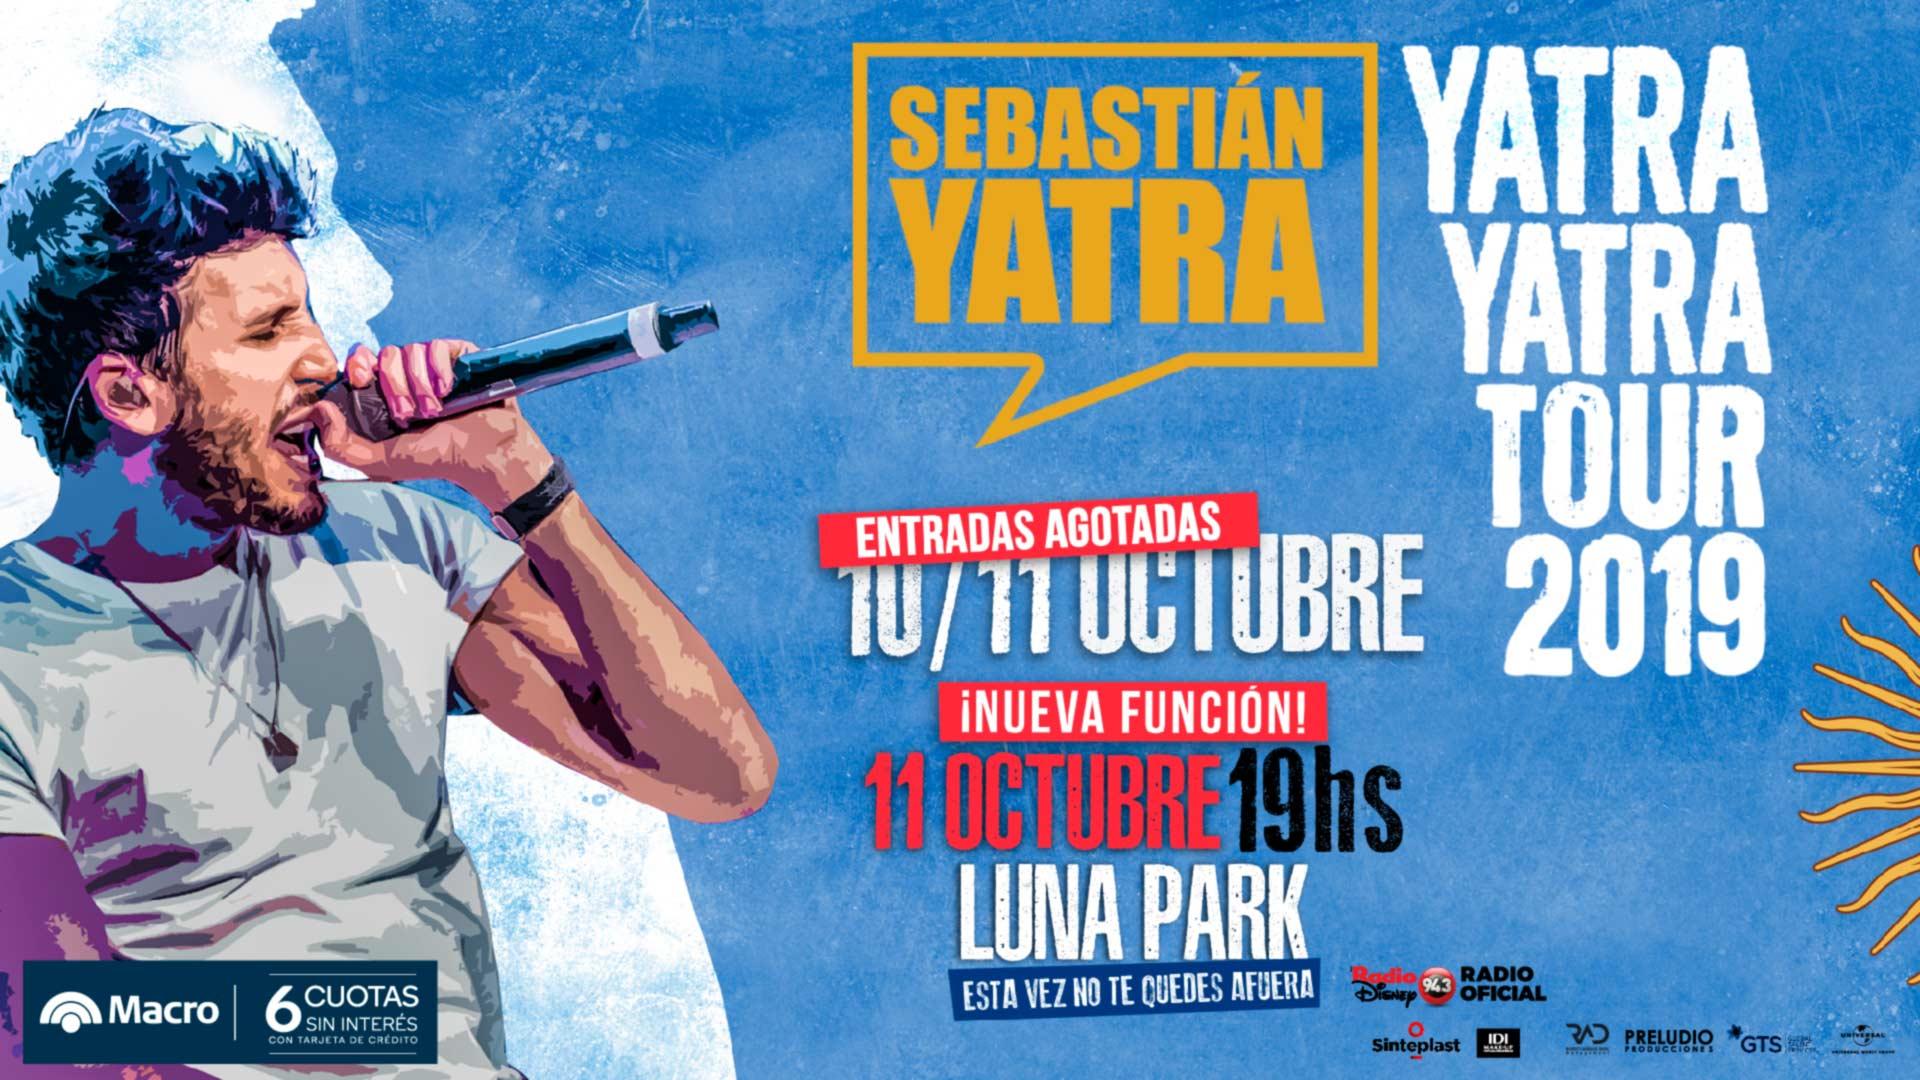 Sebastián Yatra Stadium Luna Park